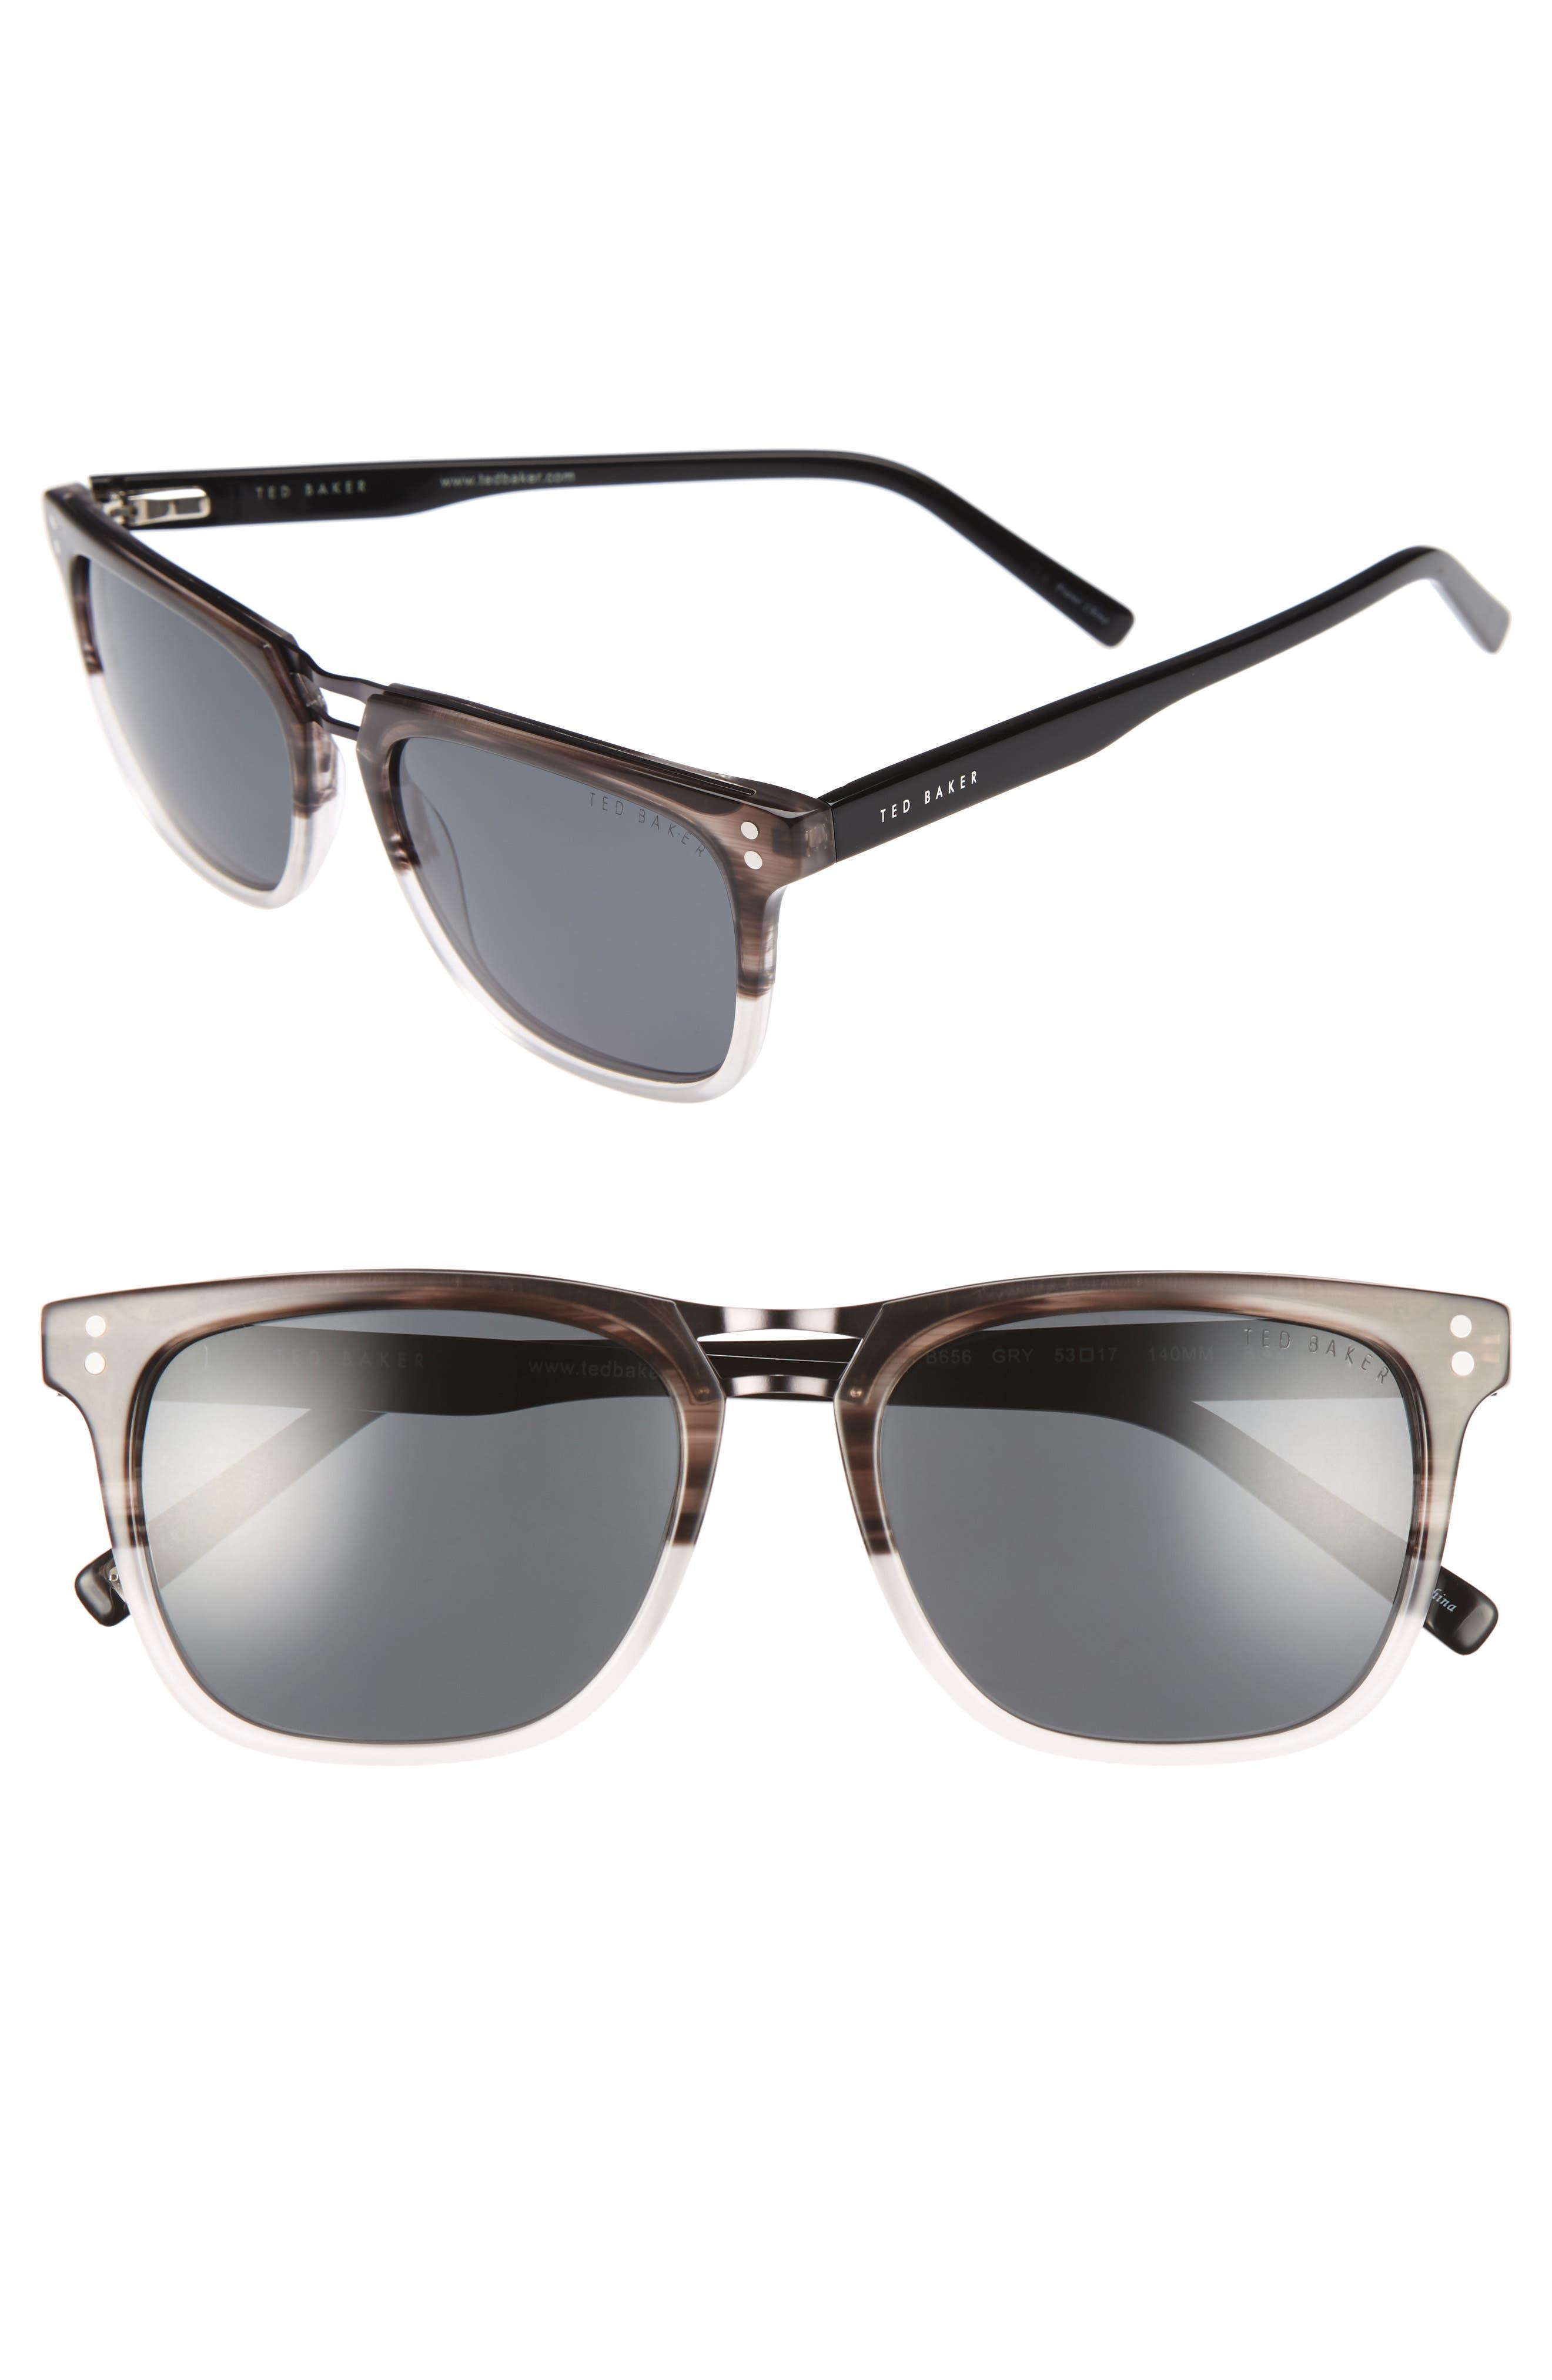 53mm Polarized Sunglasses,                             Main thumbnail 1, color,                             021